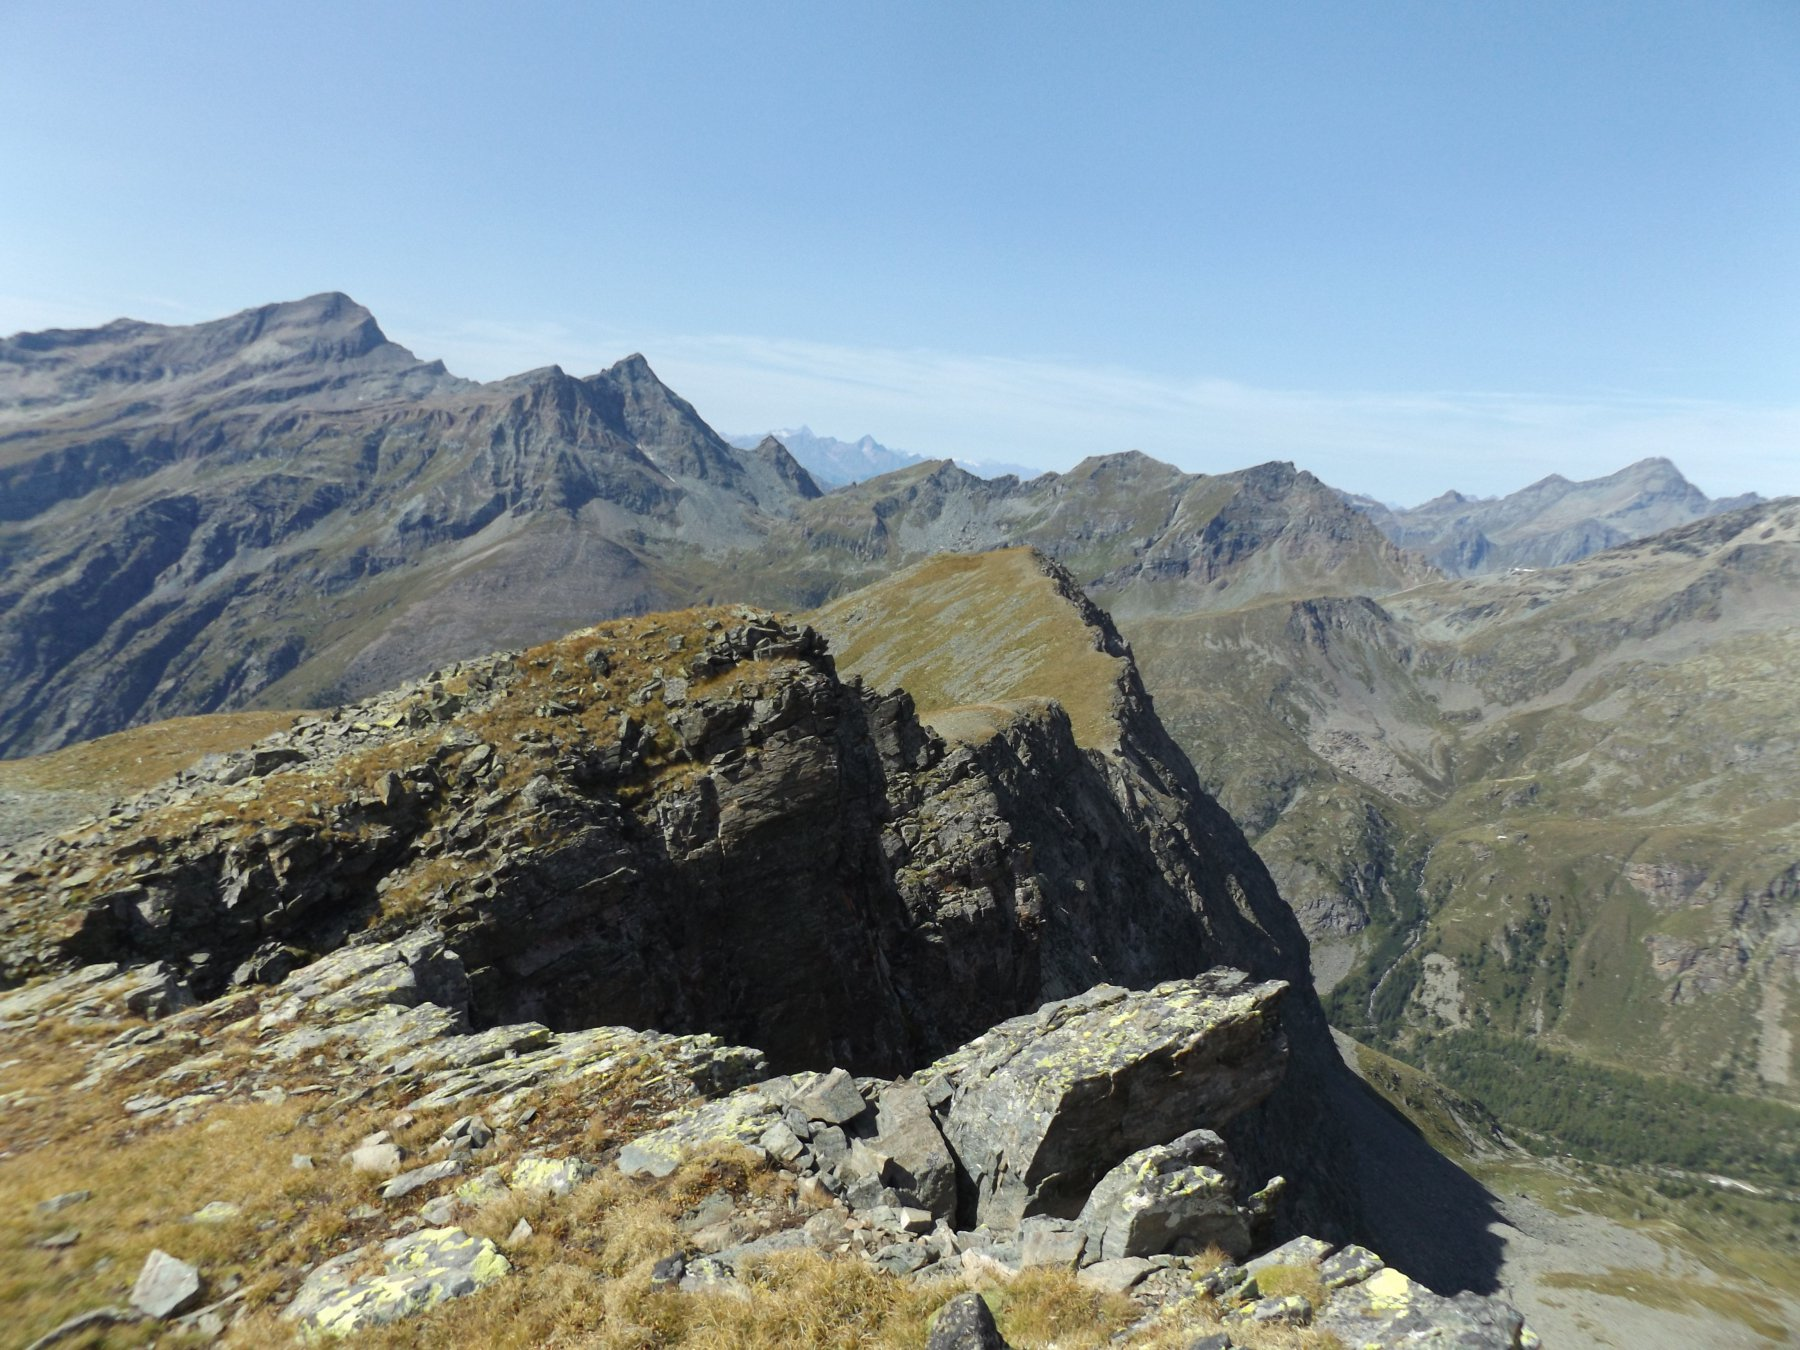 Cresta di punta Telcio vista dalla quota 2915 (Telcio Est)